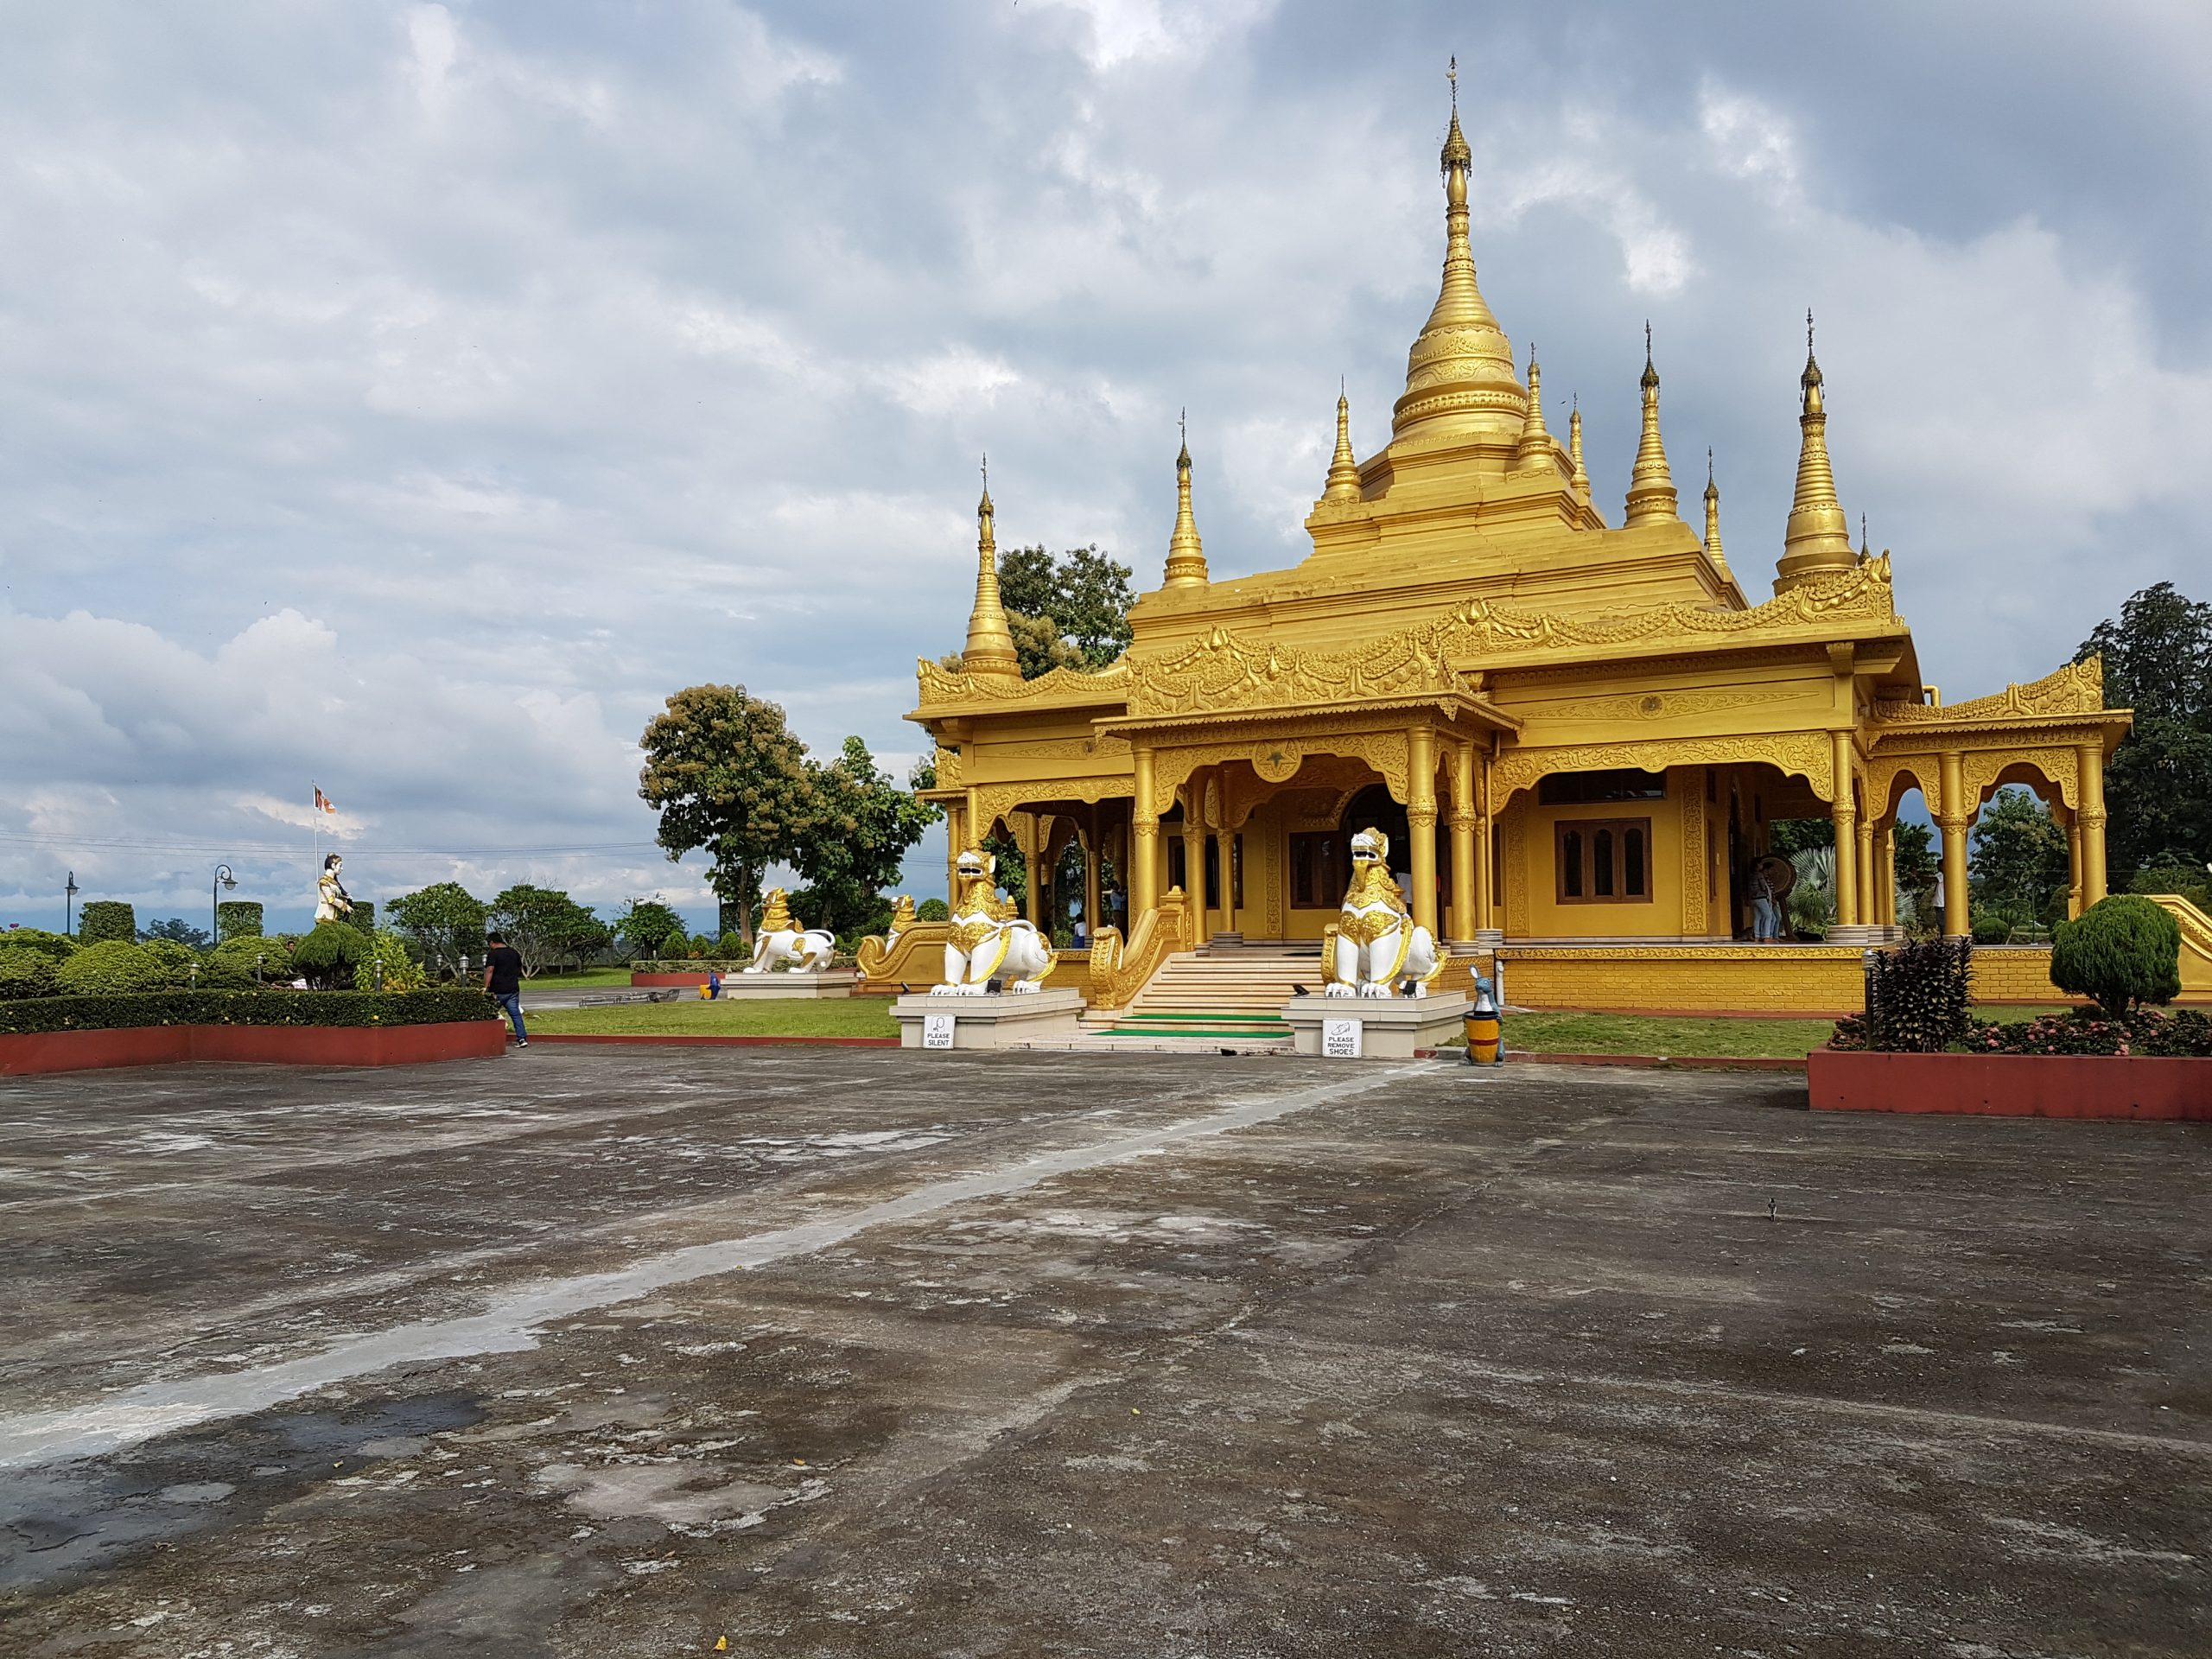 Pagoda Temple for worship